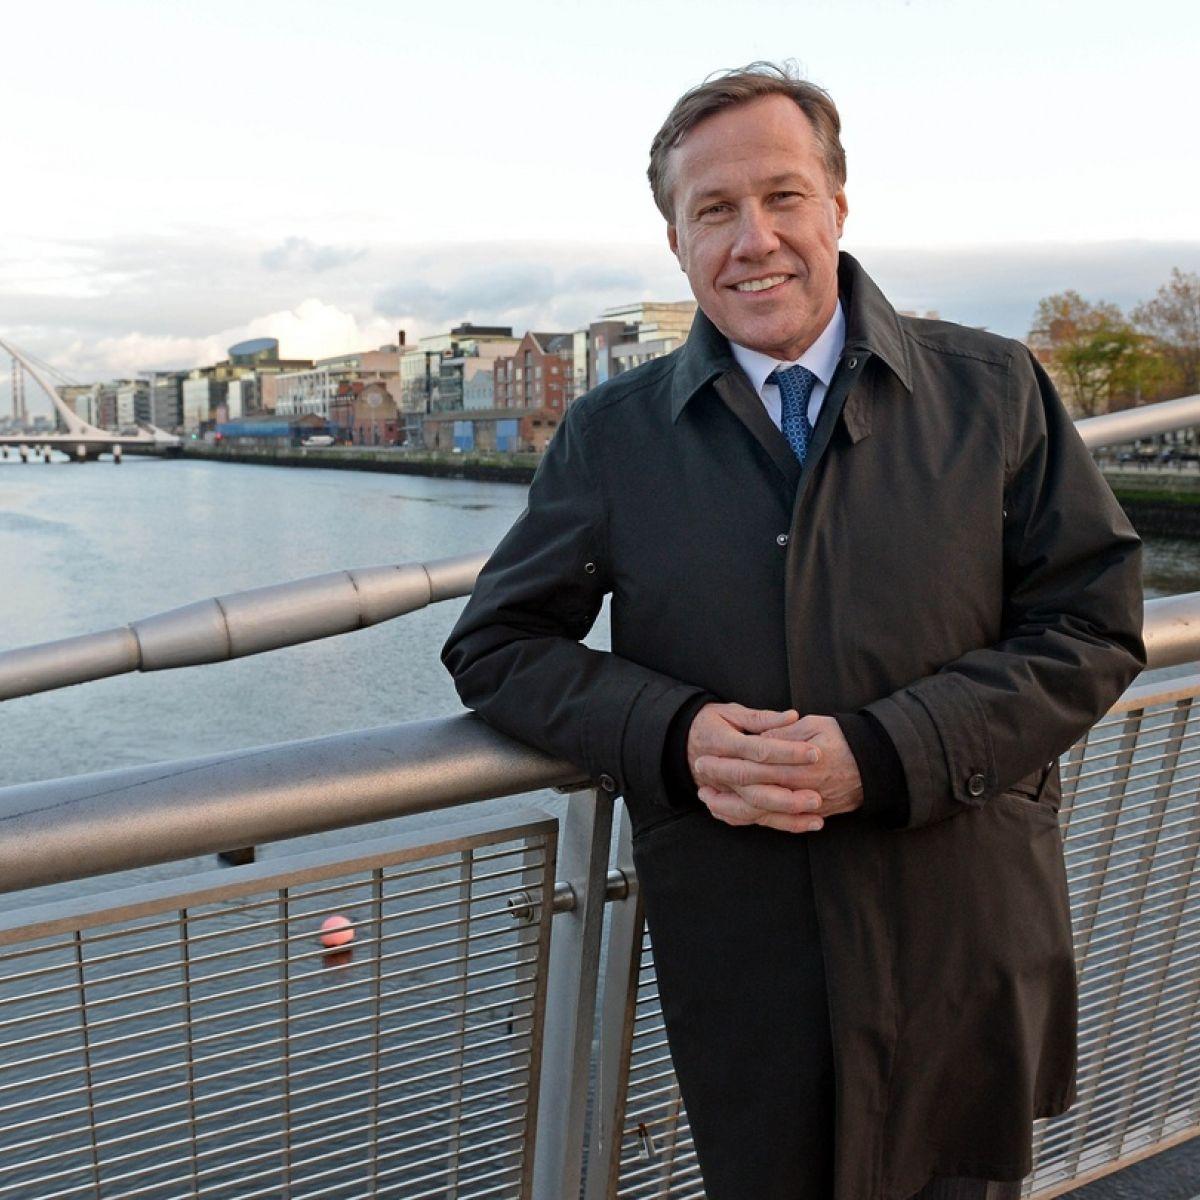 Zurich Insurance Former Ceo Martin Senn Takes Own Life